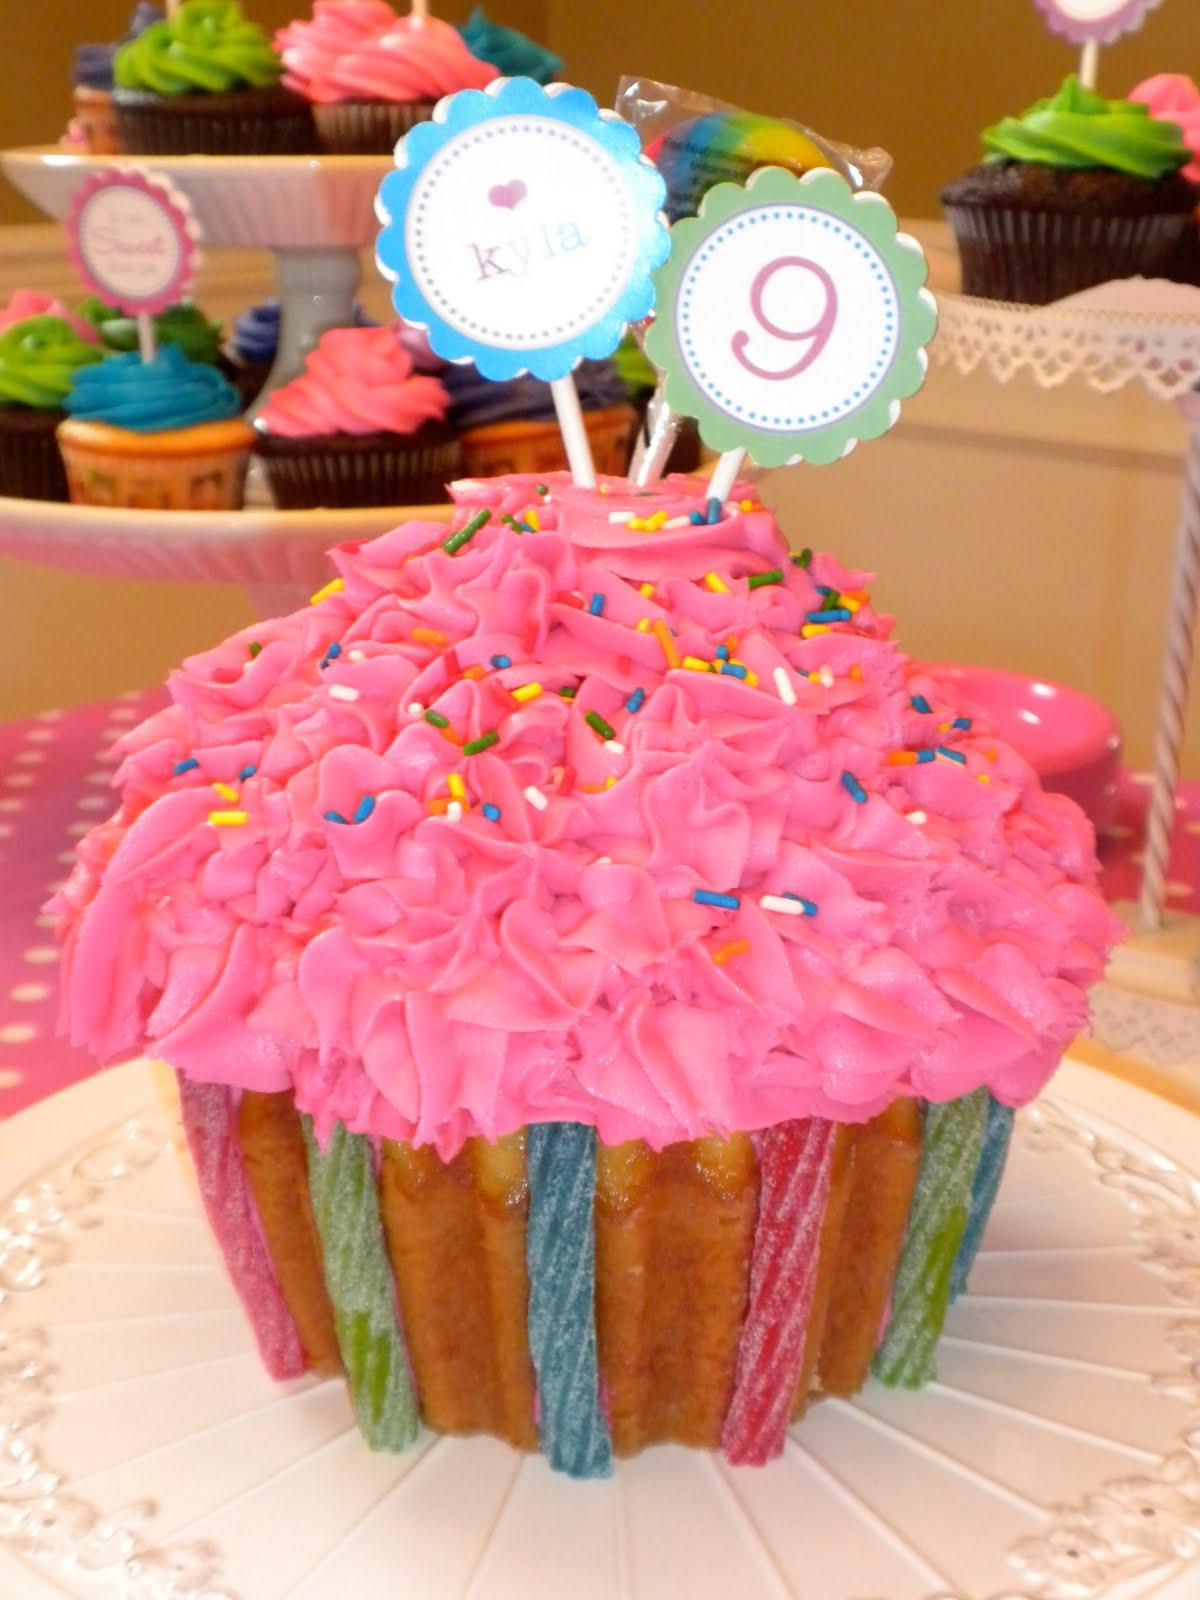 Stout Family Blog Kylas Sweet Shoppe 9th Birthday Party